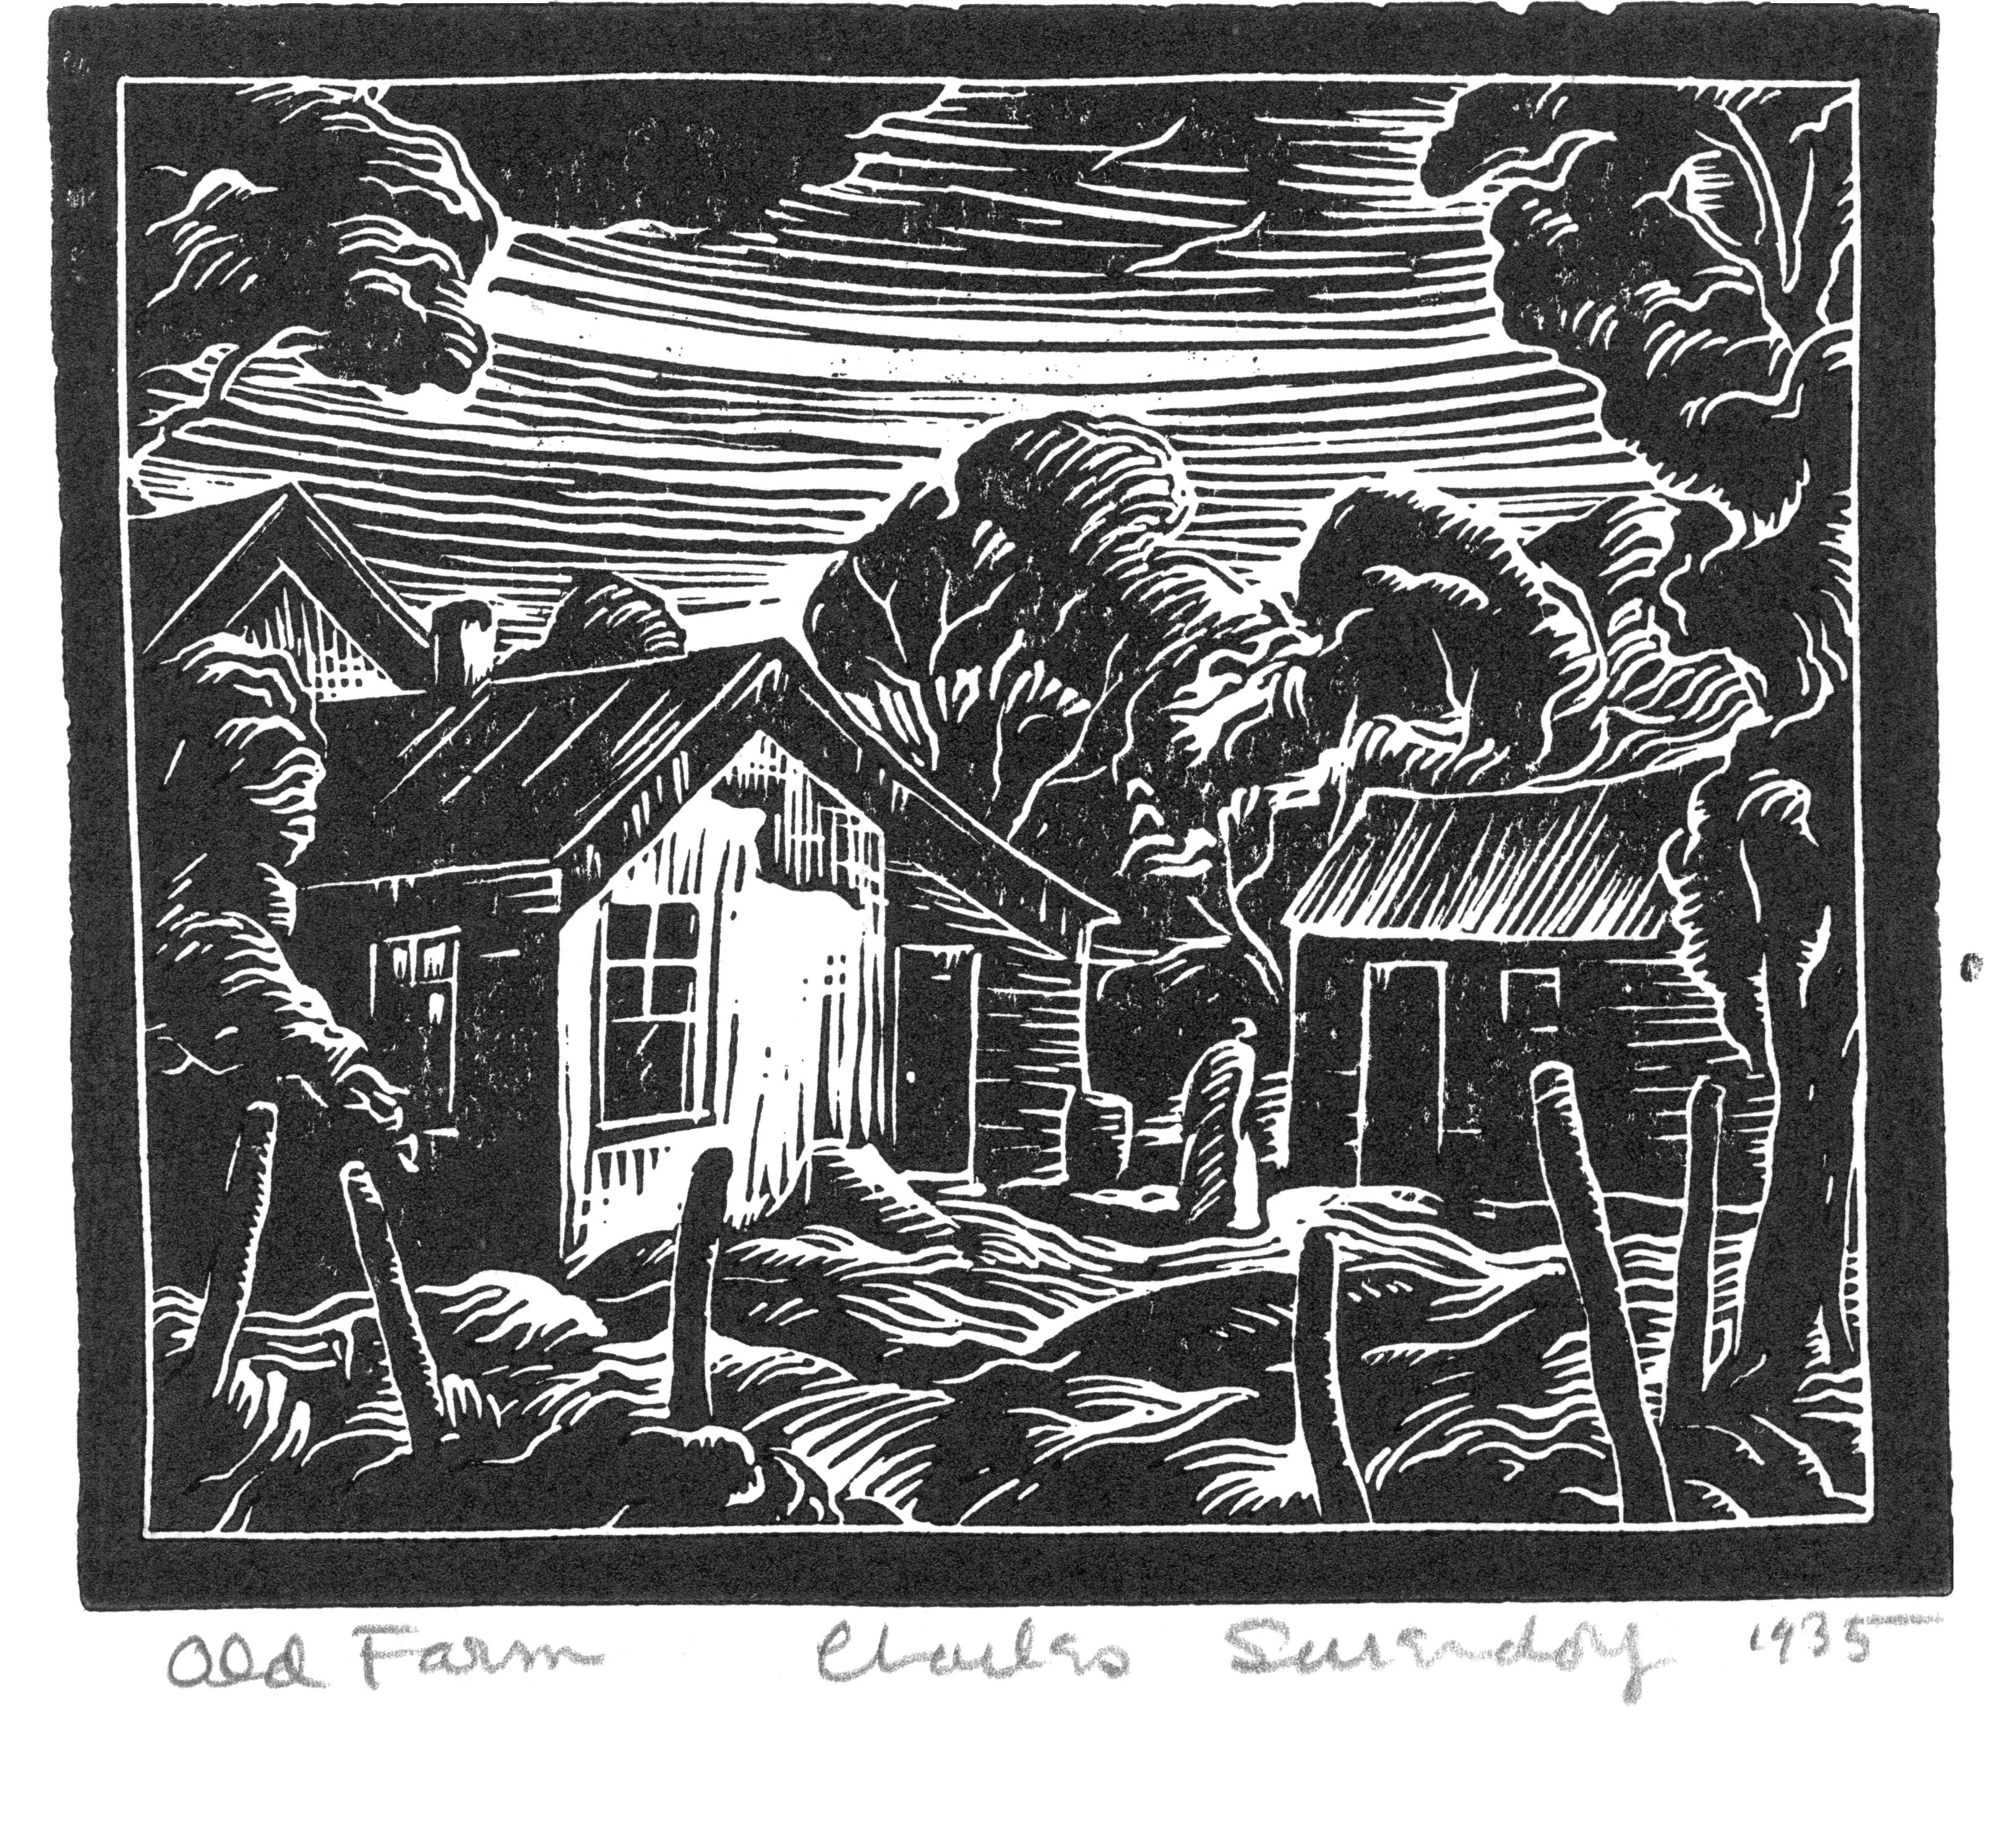 Old_Farm